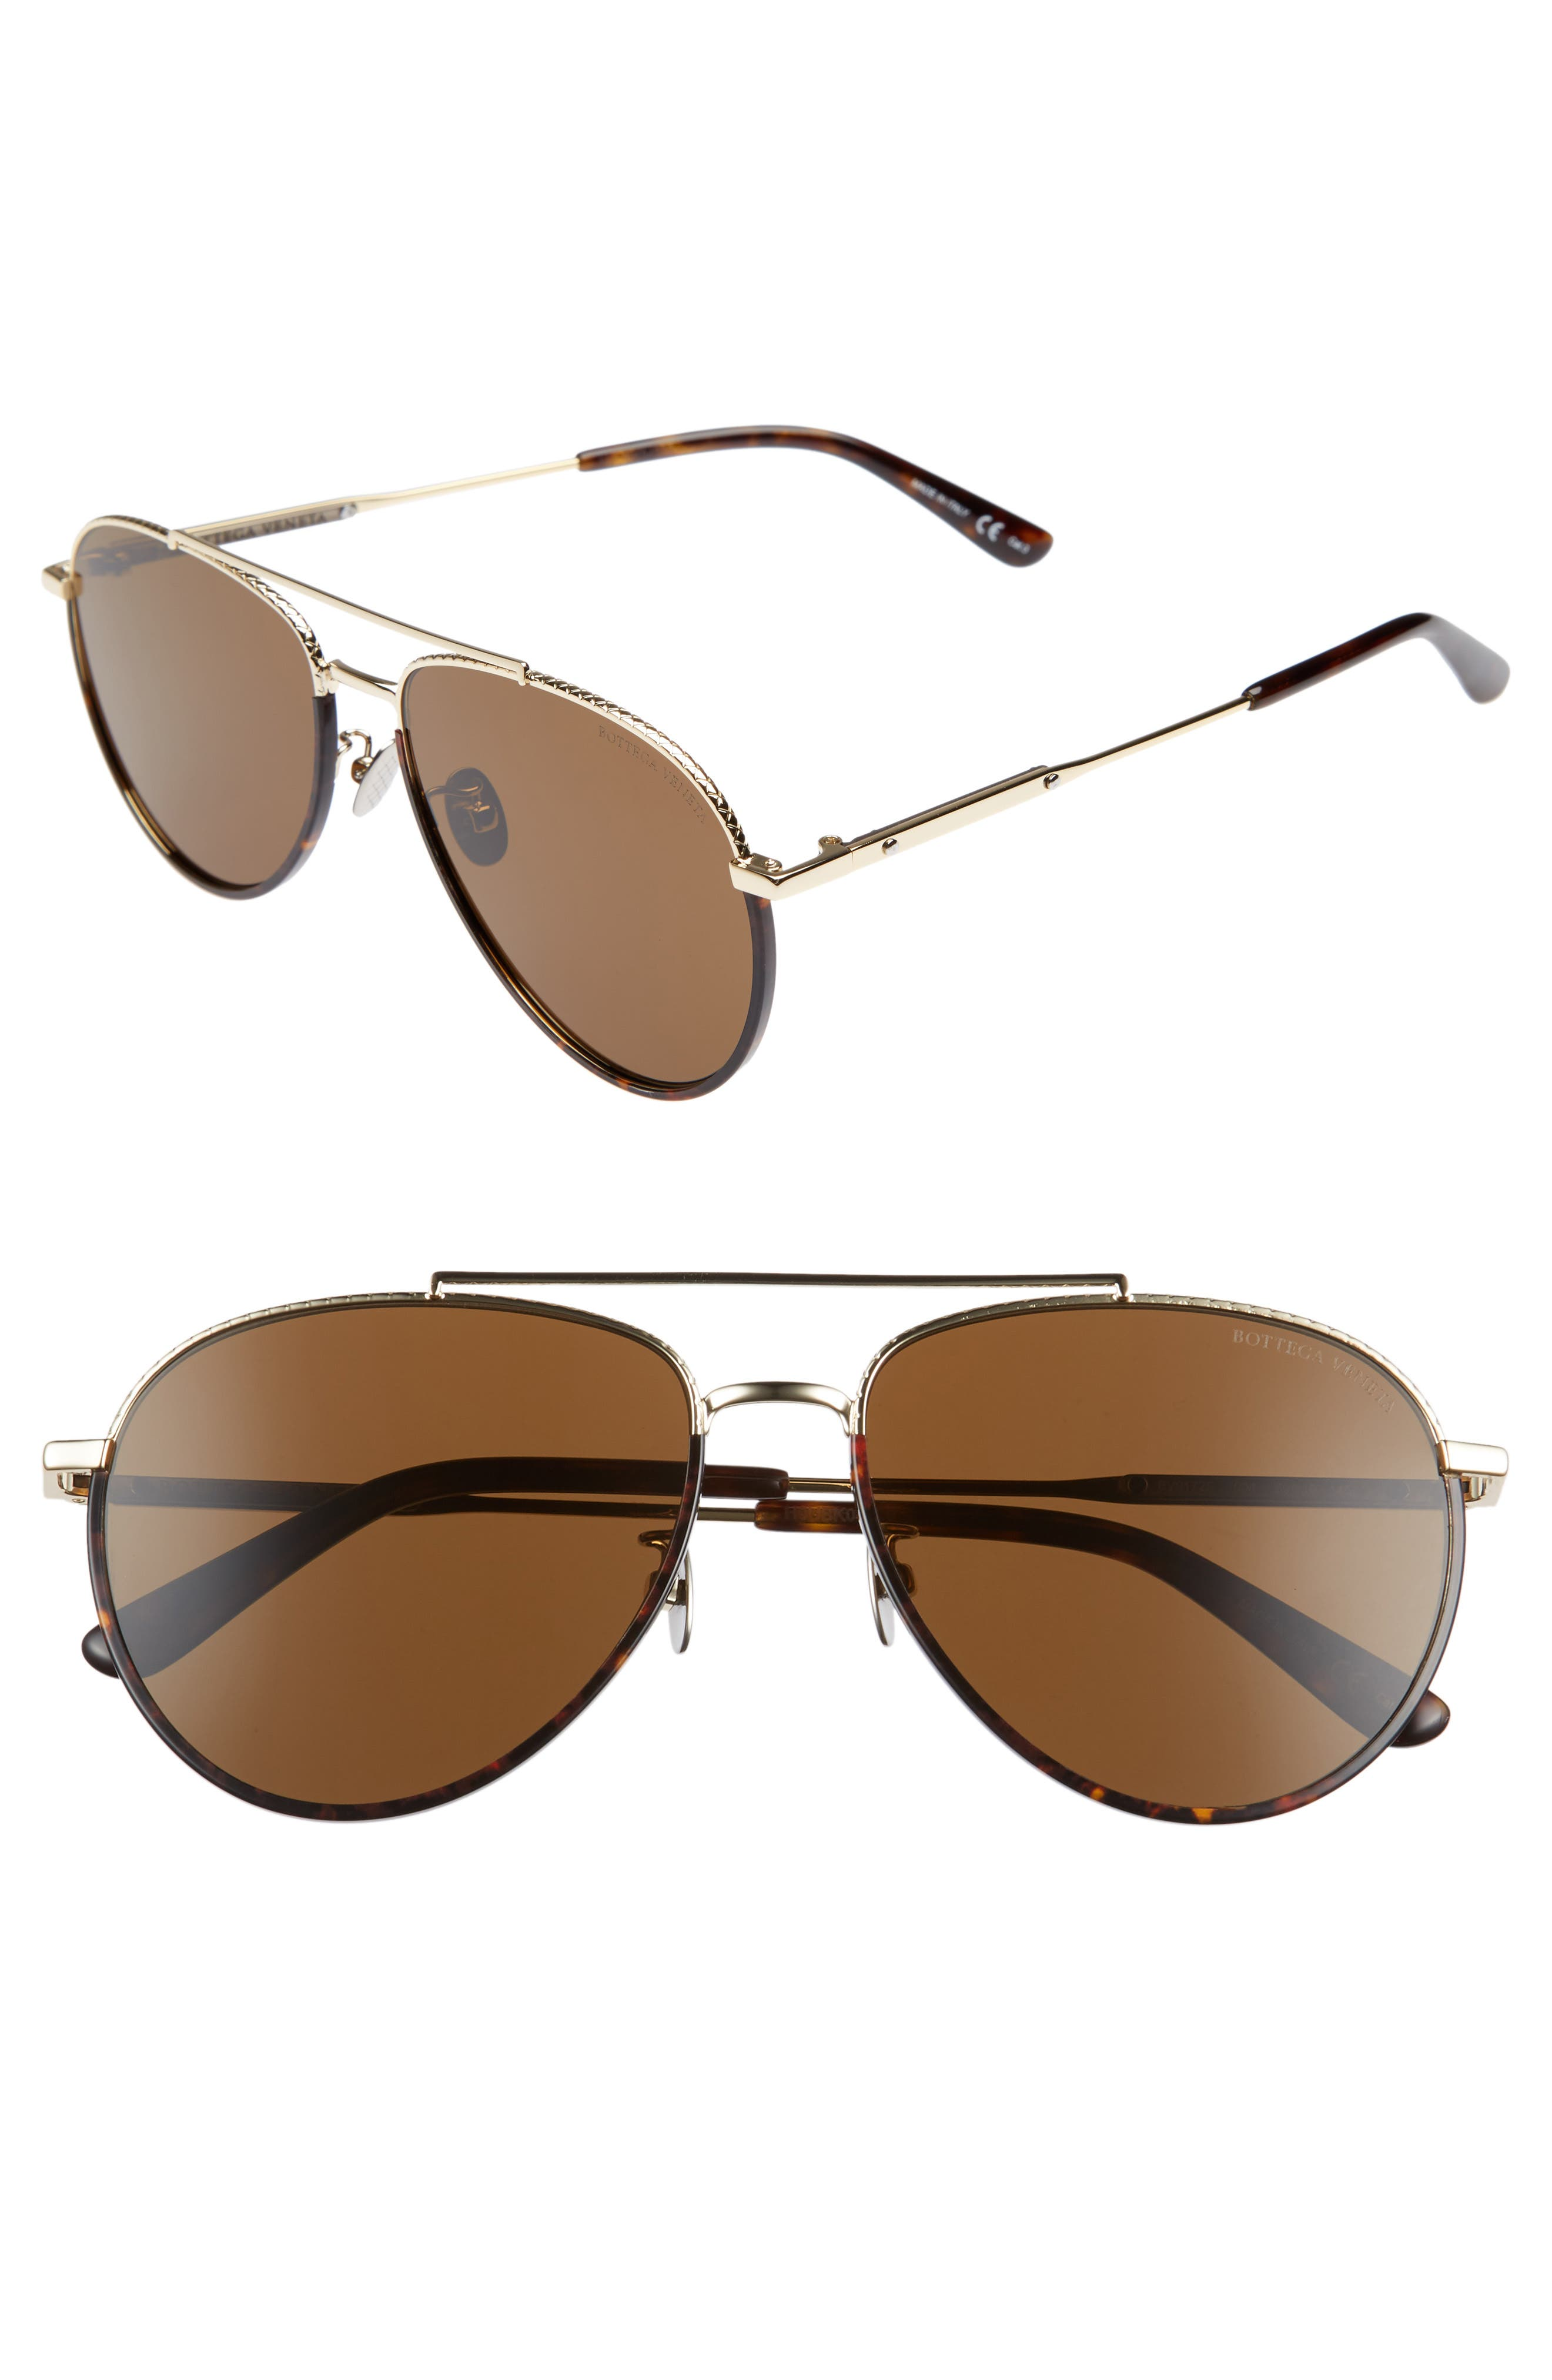 Main Image - Bottega Veneta 59mm Aviator Sunglasses